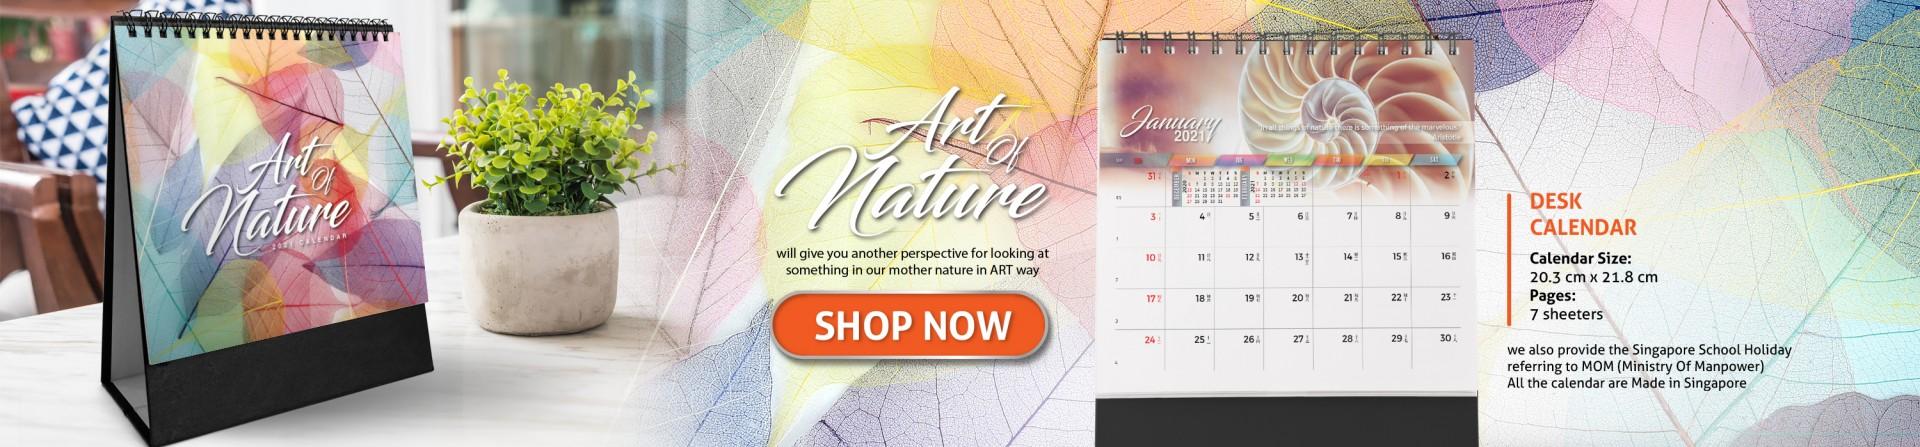 art of nature retail banner